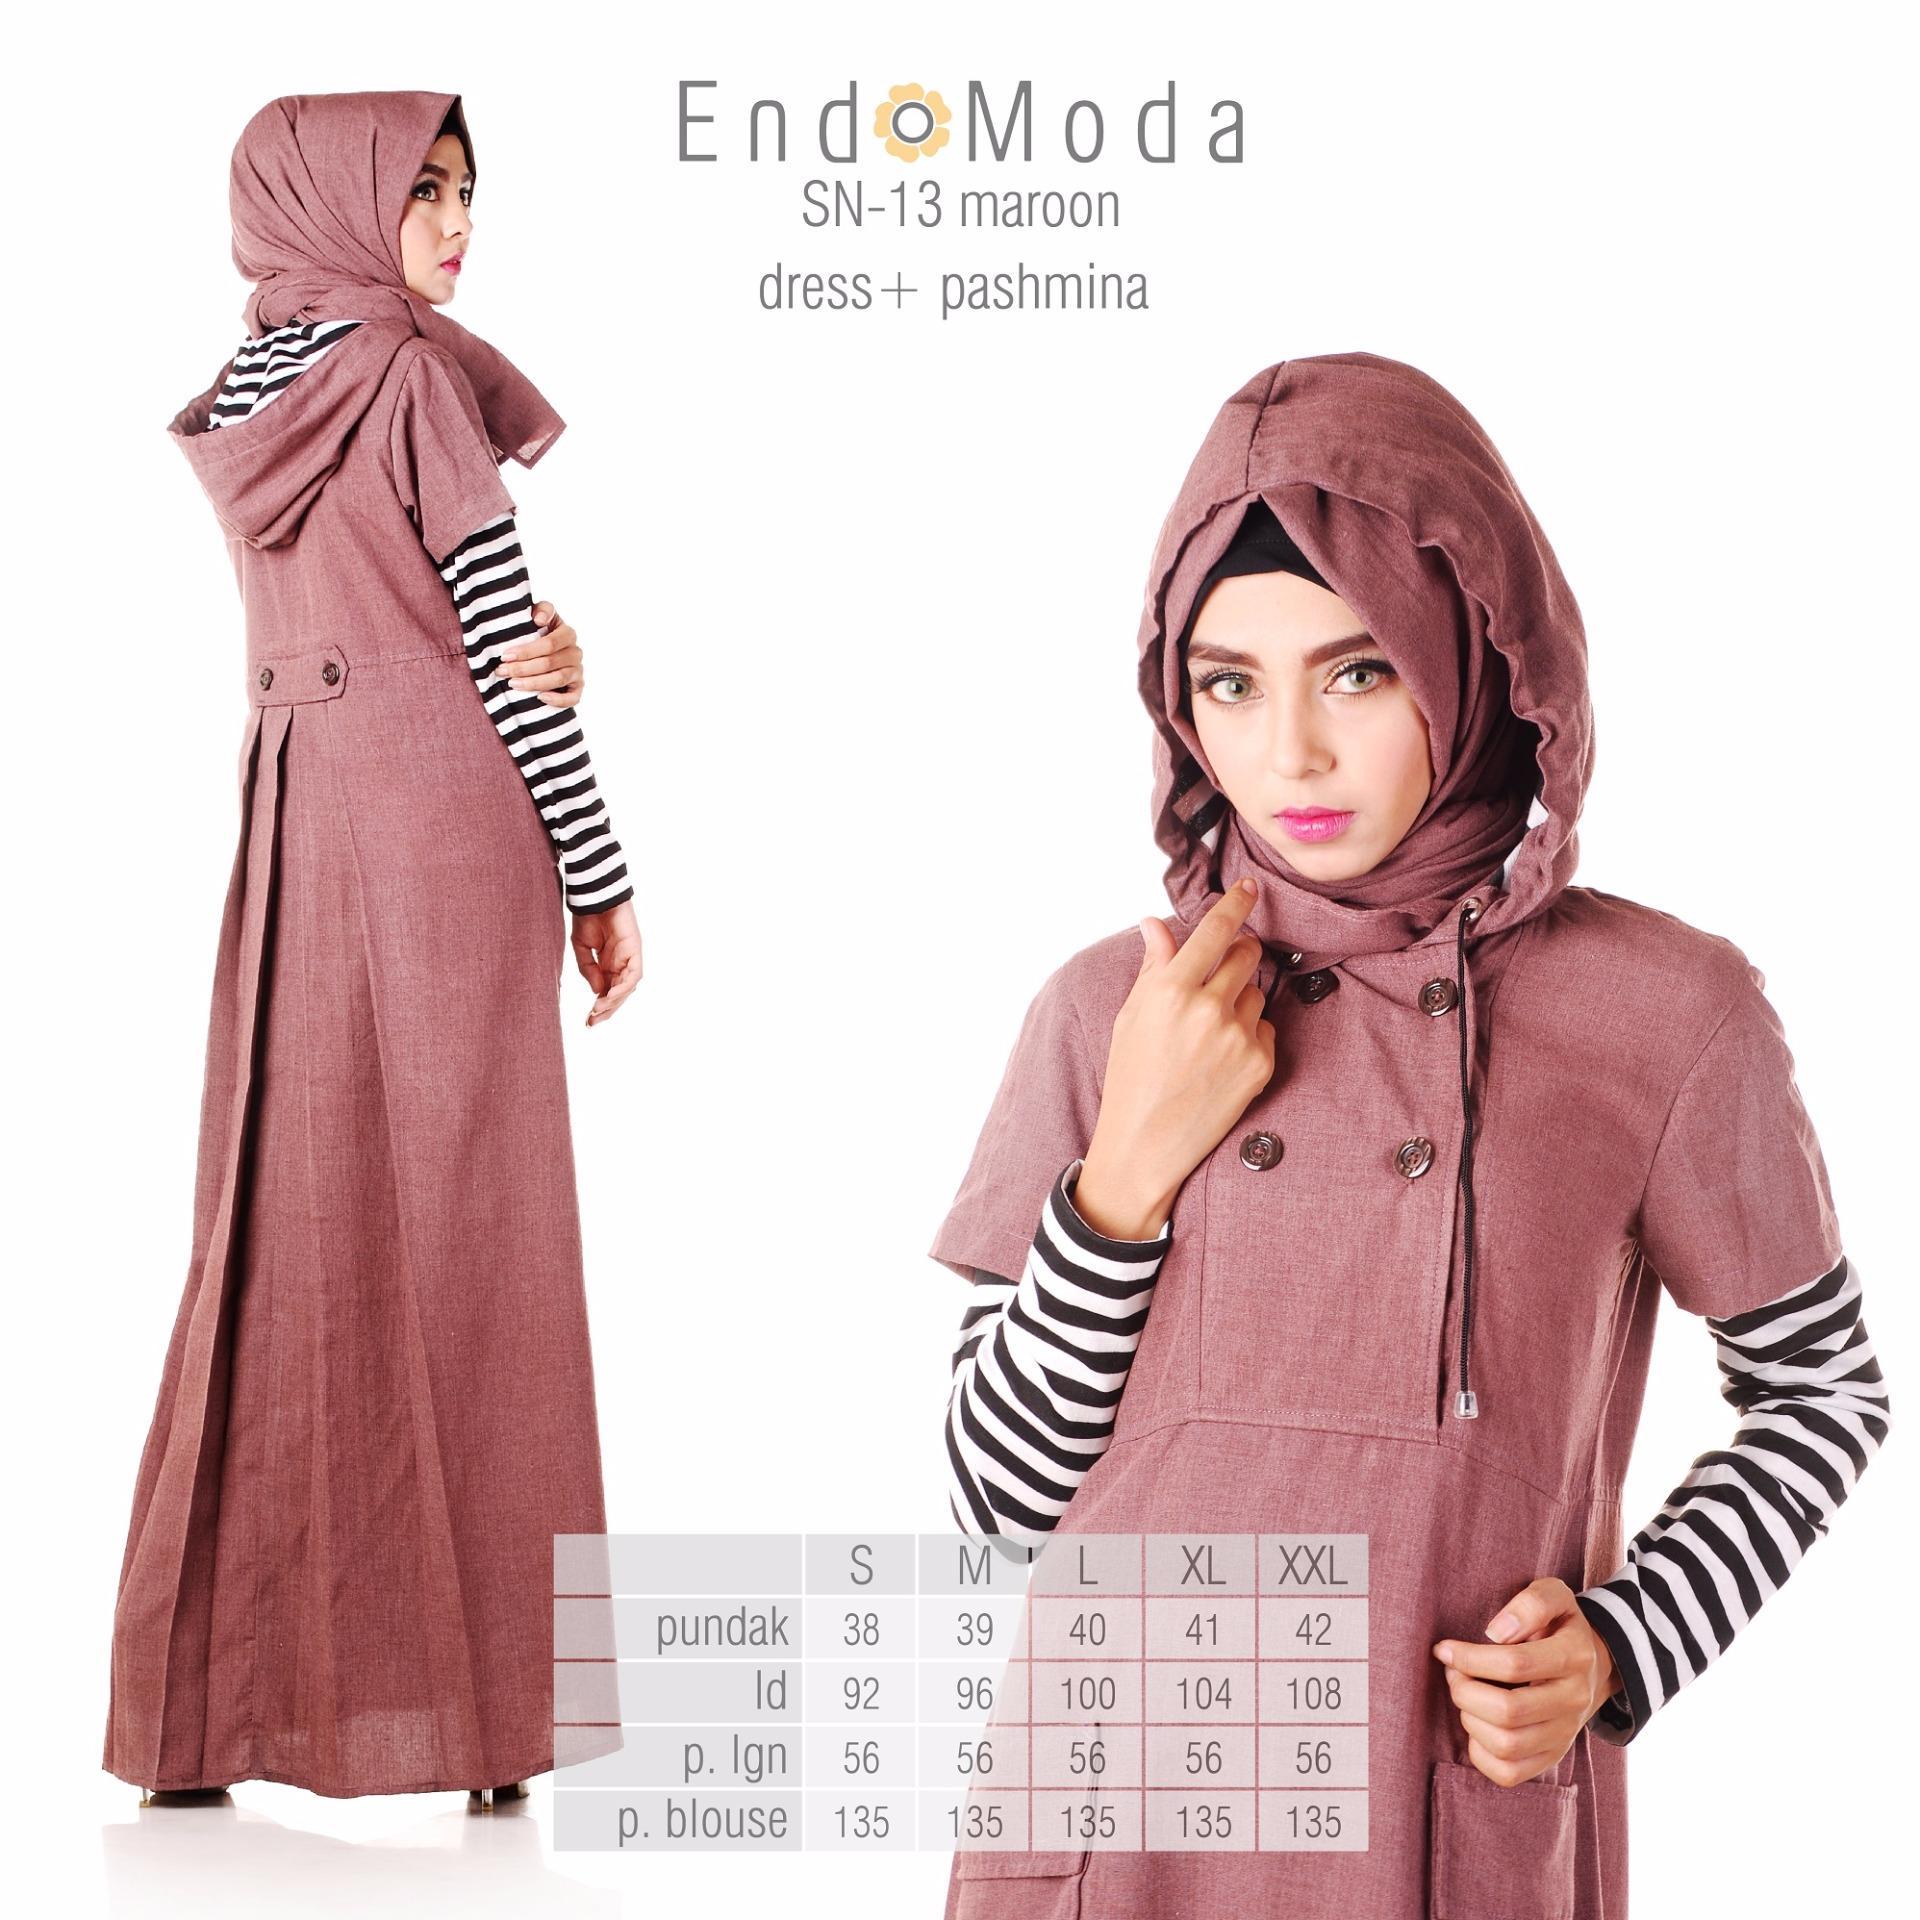 Baju Original Endo Moda Sn 13 Dress Wanita Baju Muslim Modern Gamis Katun Supernova Premium Warna Maroon Baju Original Diskon 50